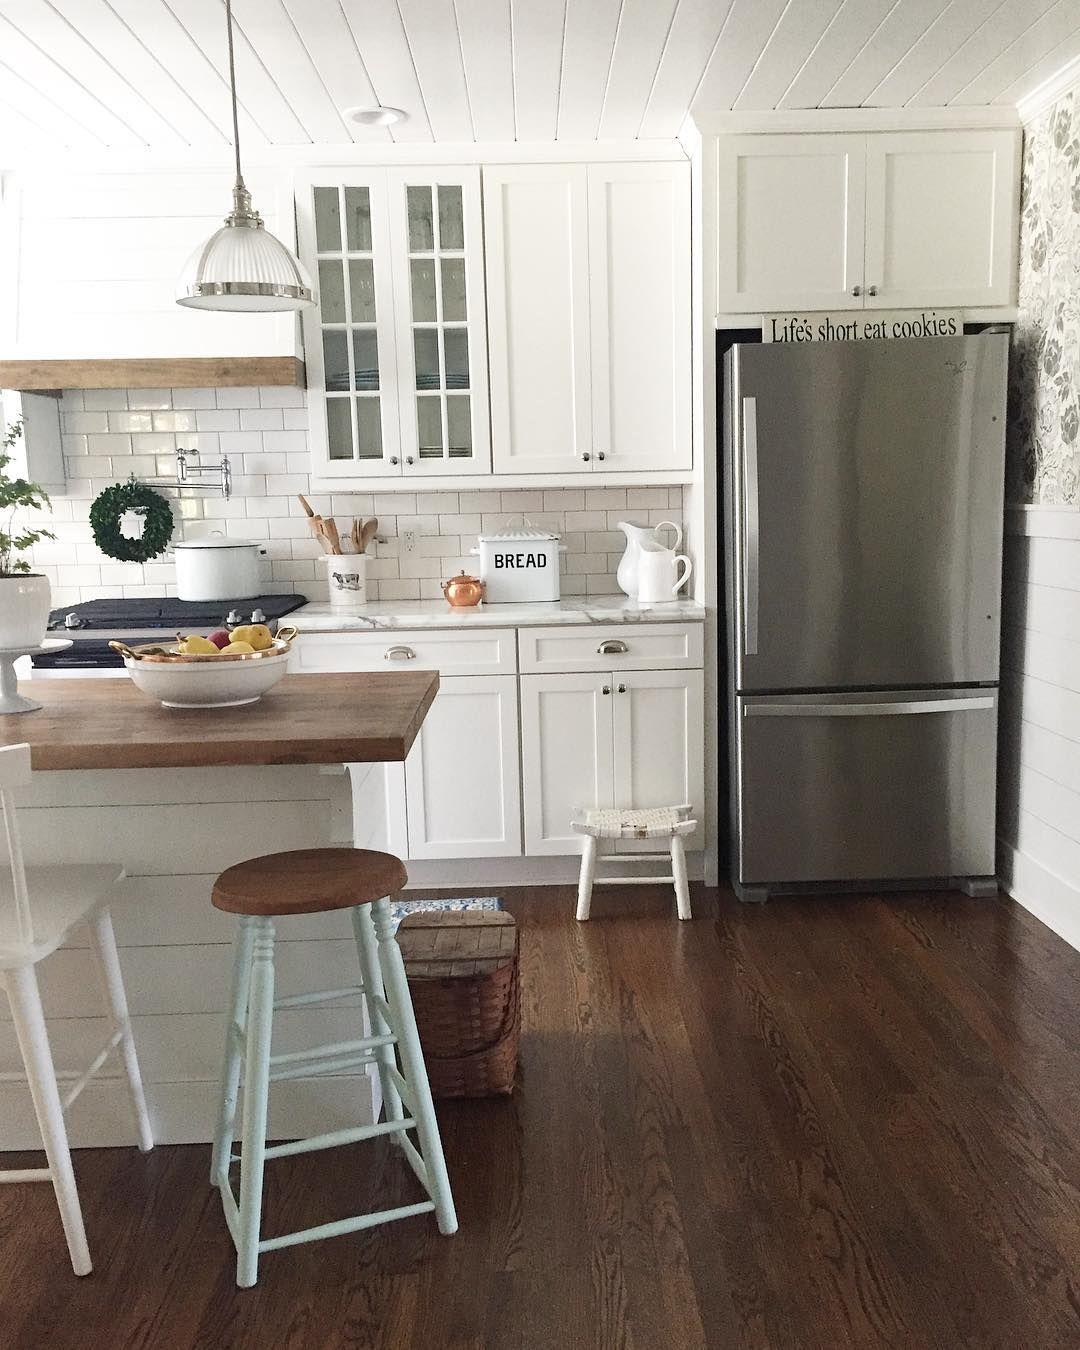 Pin de Kylee Garafolo en Kitchens   Pinterest   Barra cocina y Cocinas